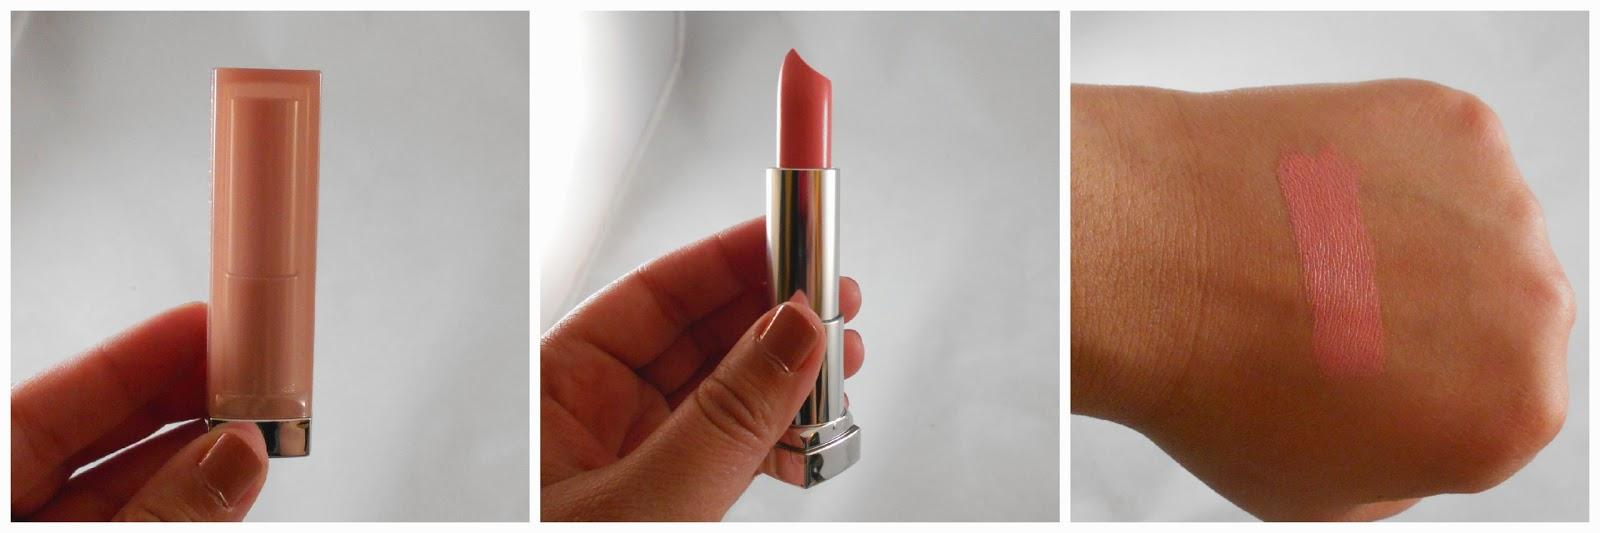 Maybelline ColorSensational Lipstick in Ravishing Rose